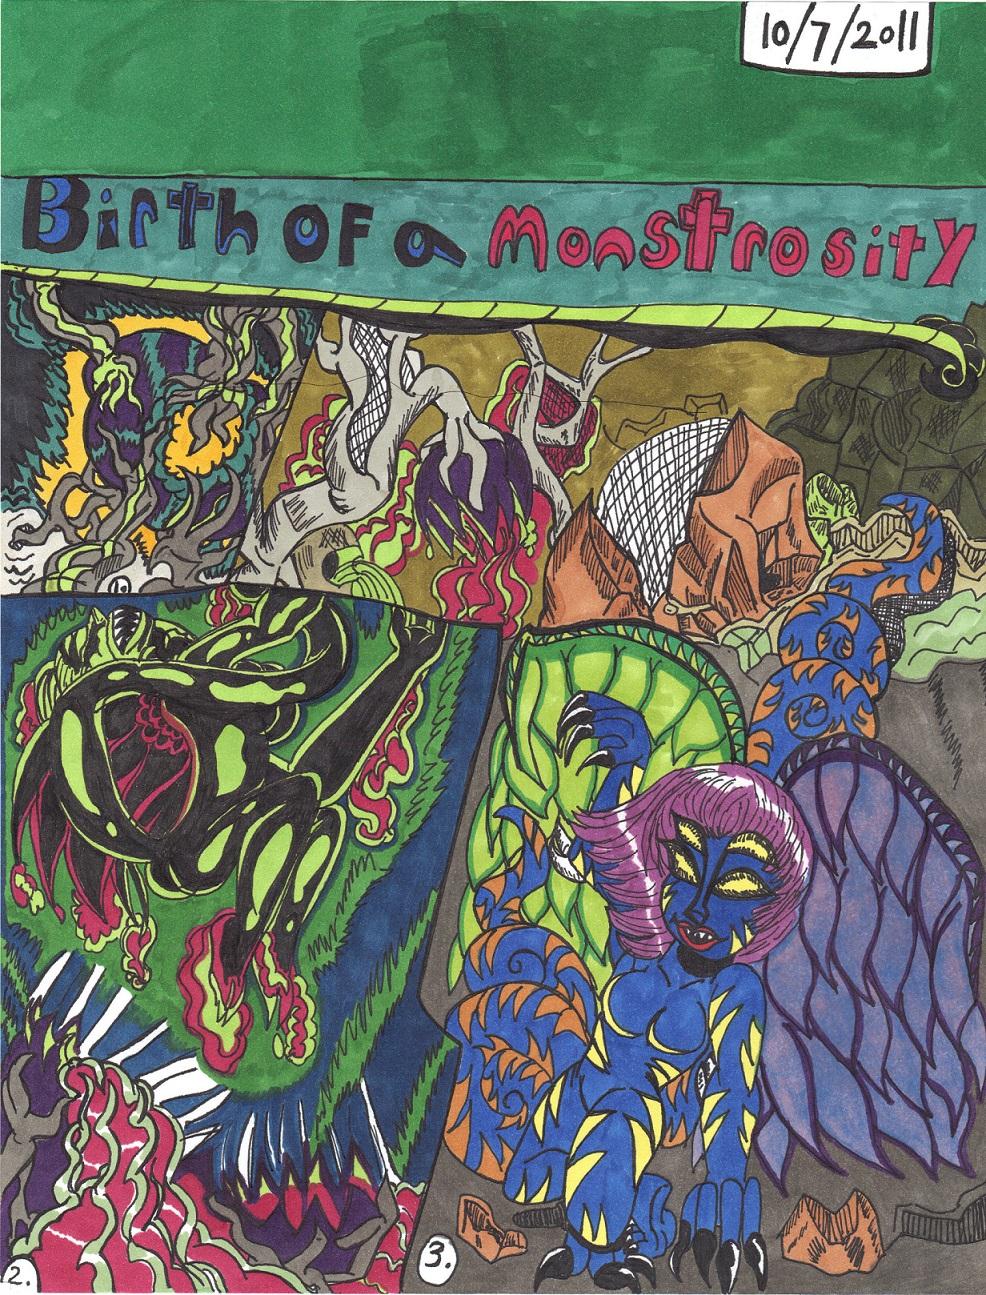 Birth of a Monstrosity